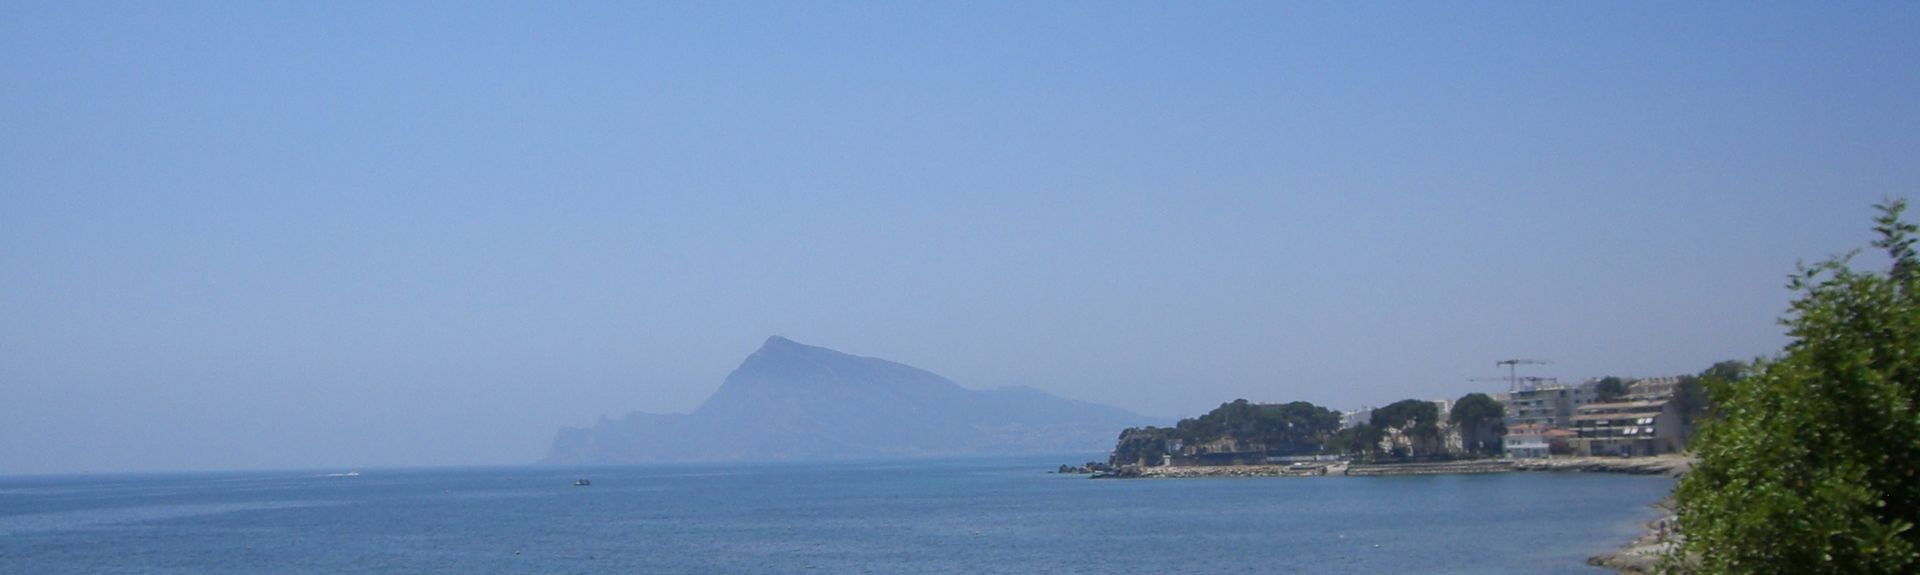 Golf Bahía, Finestrat, Wspólnota Walencka, Hiszpania